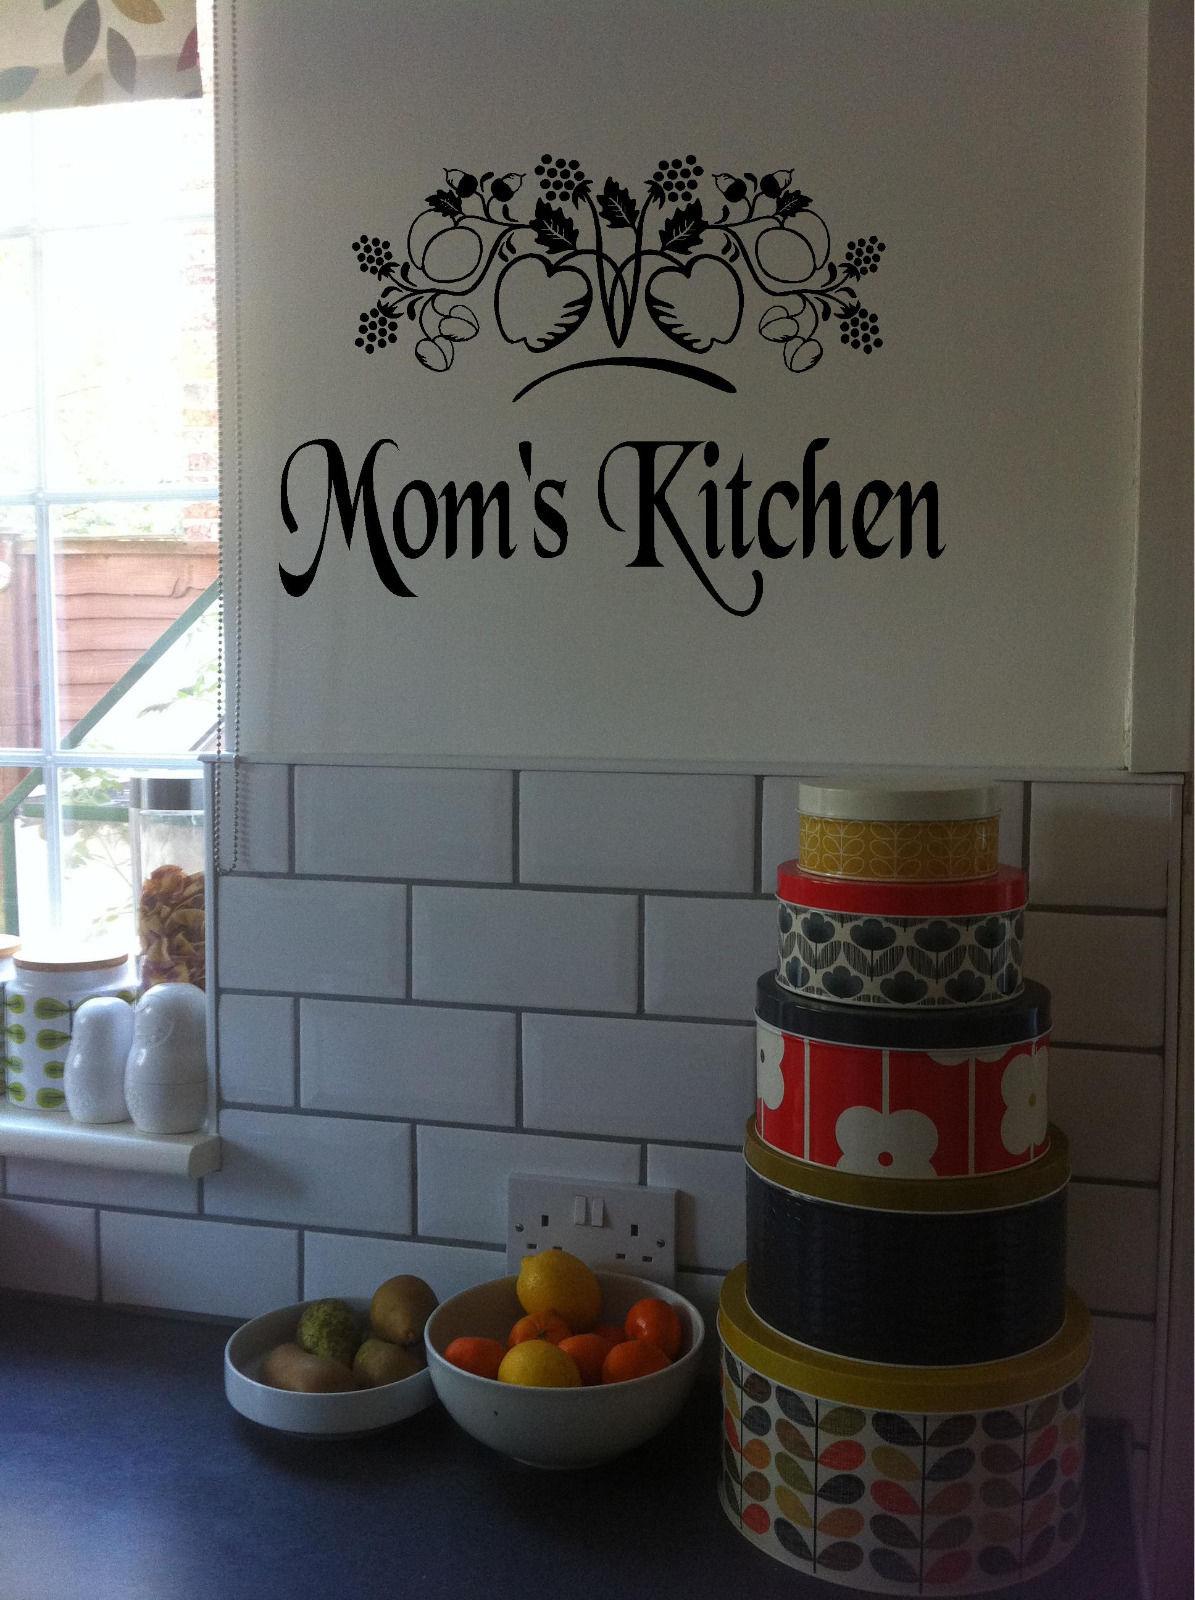 Personalized kitchen decor photo - 2